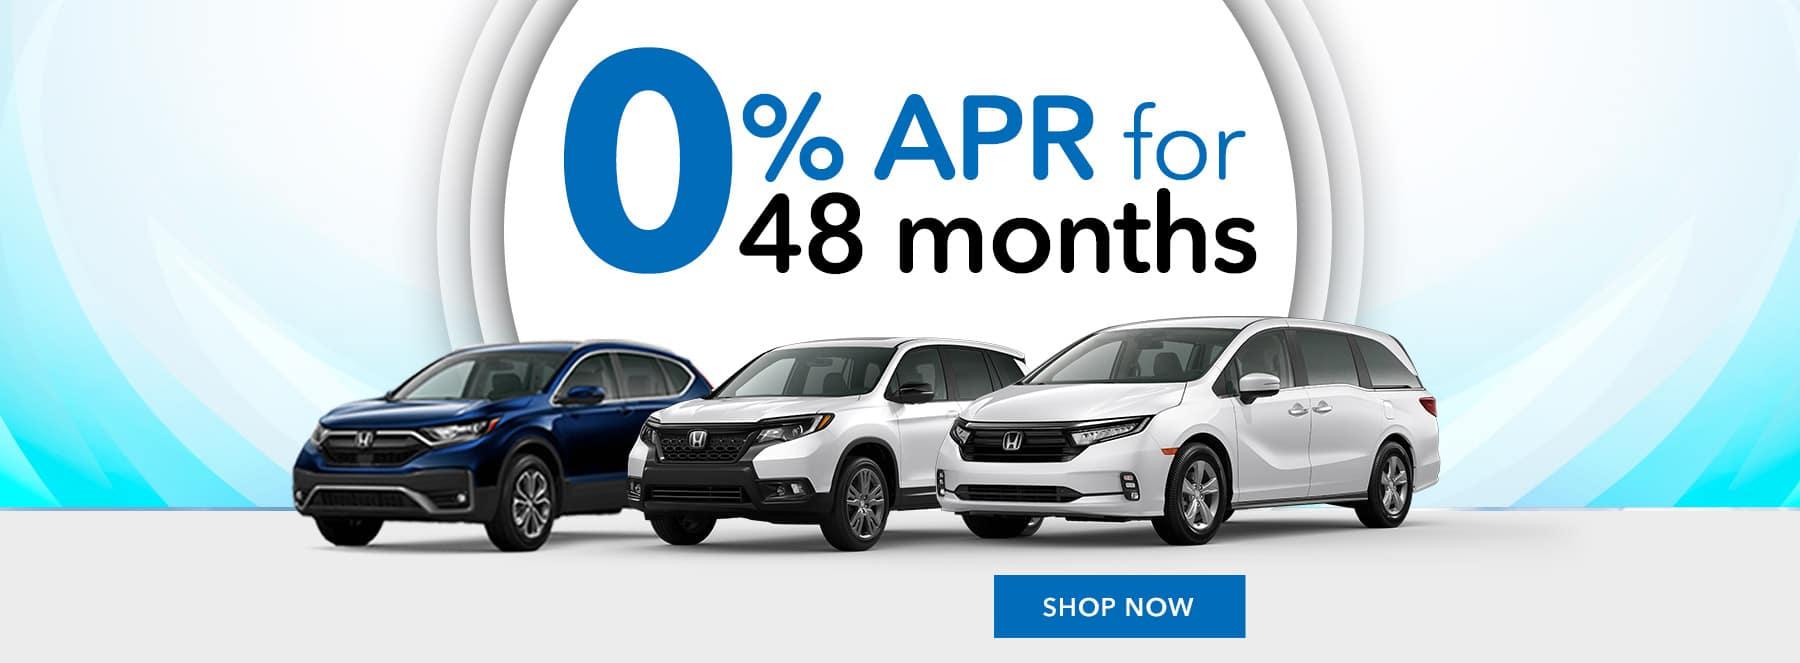 Honda 0% APR for 48 months